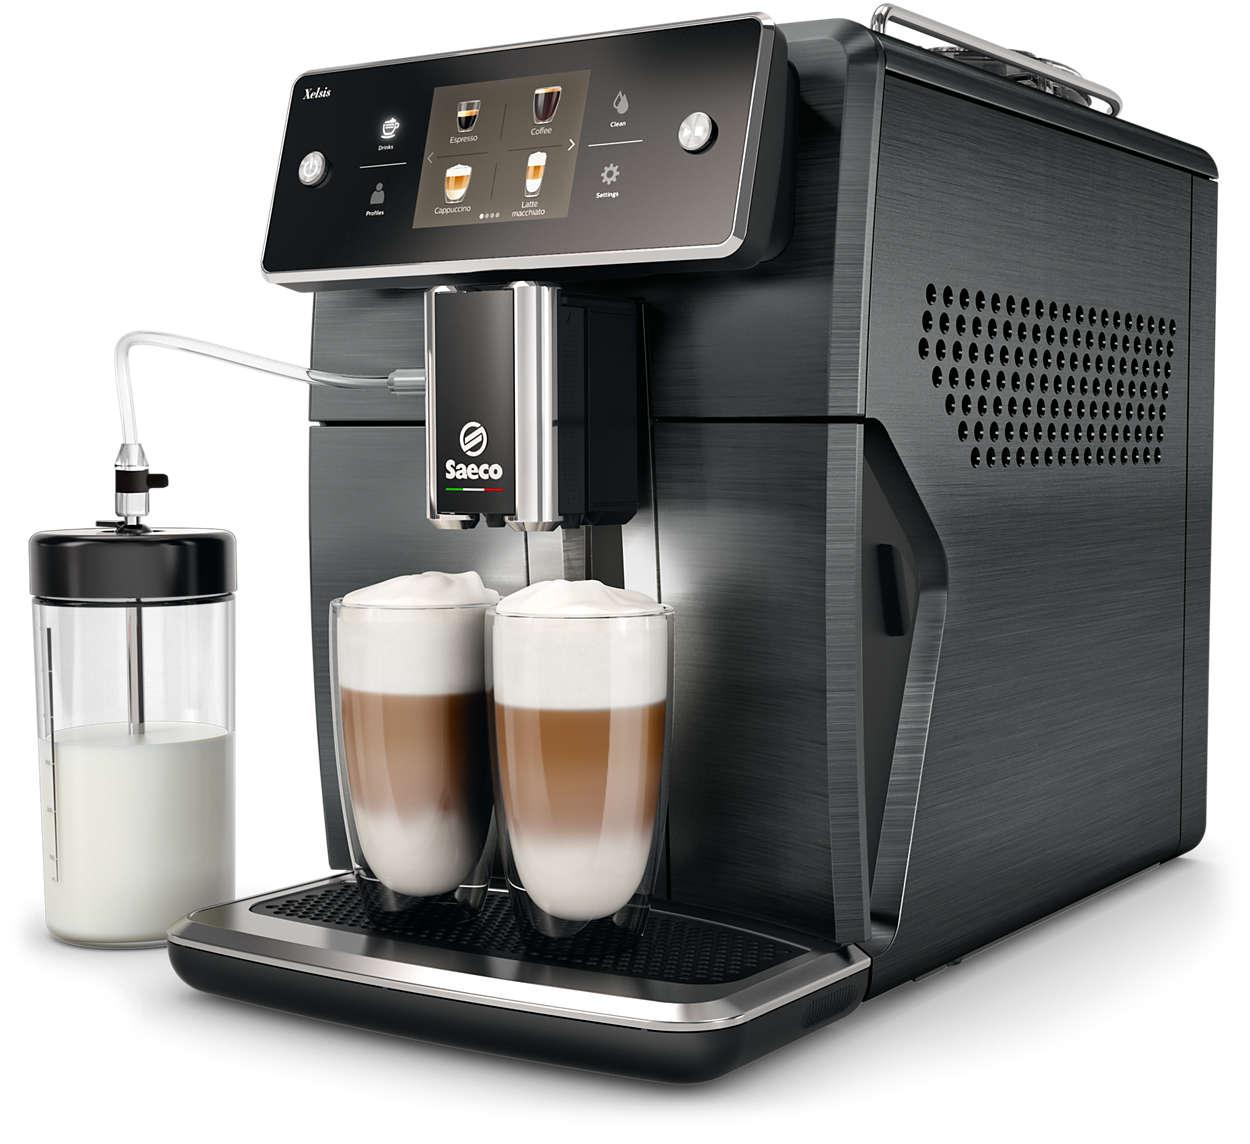 The most advanced Saeco espresso machine yet